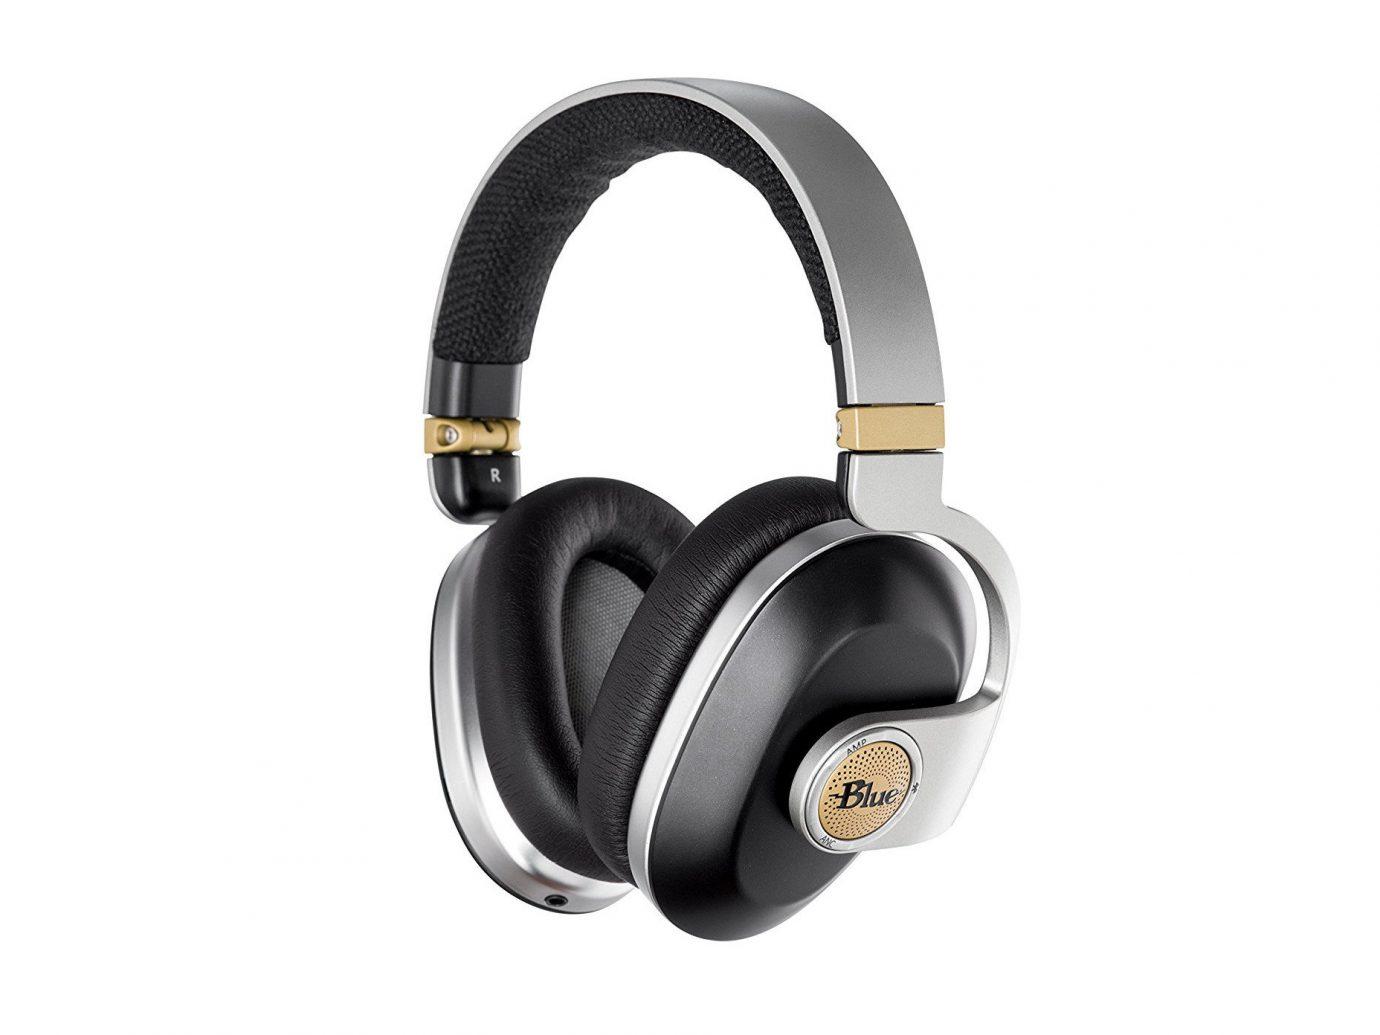 Travel Tips earphone headphones electronics technology audio equipment audio electronic device headset product design product